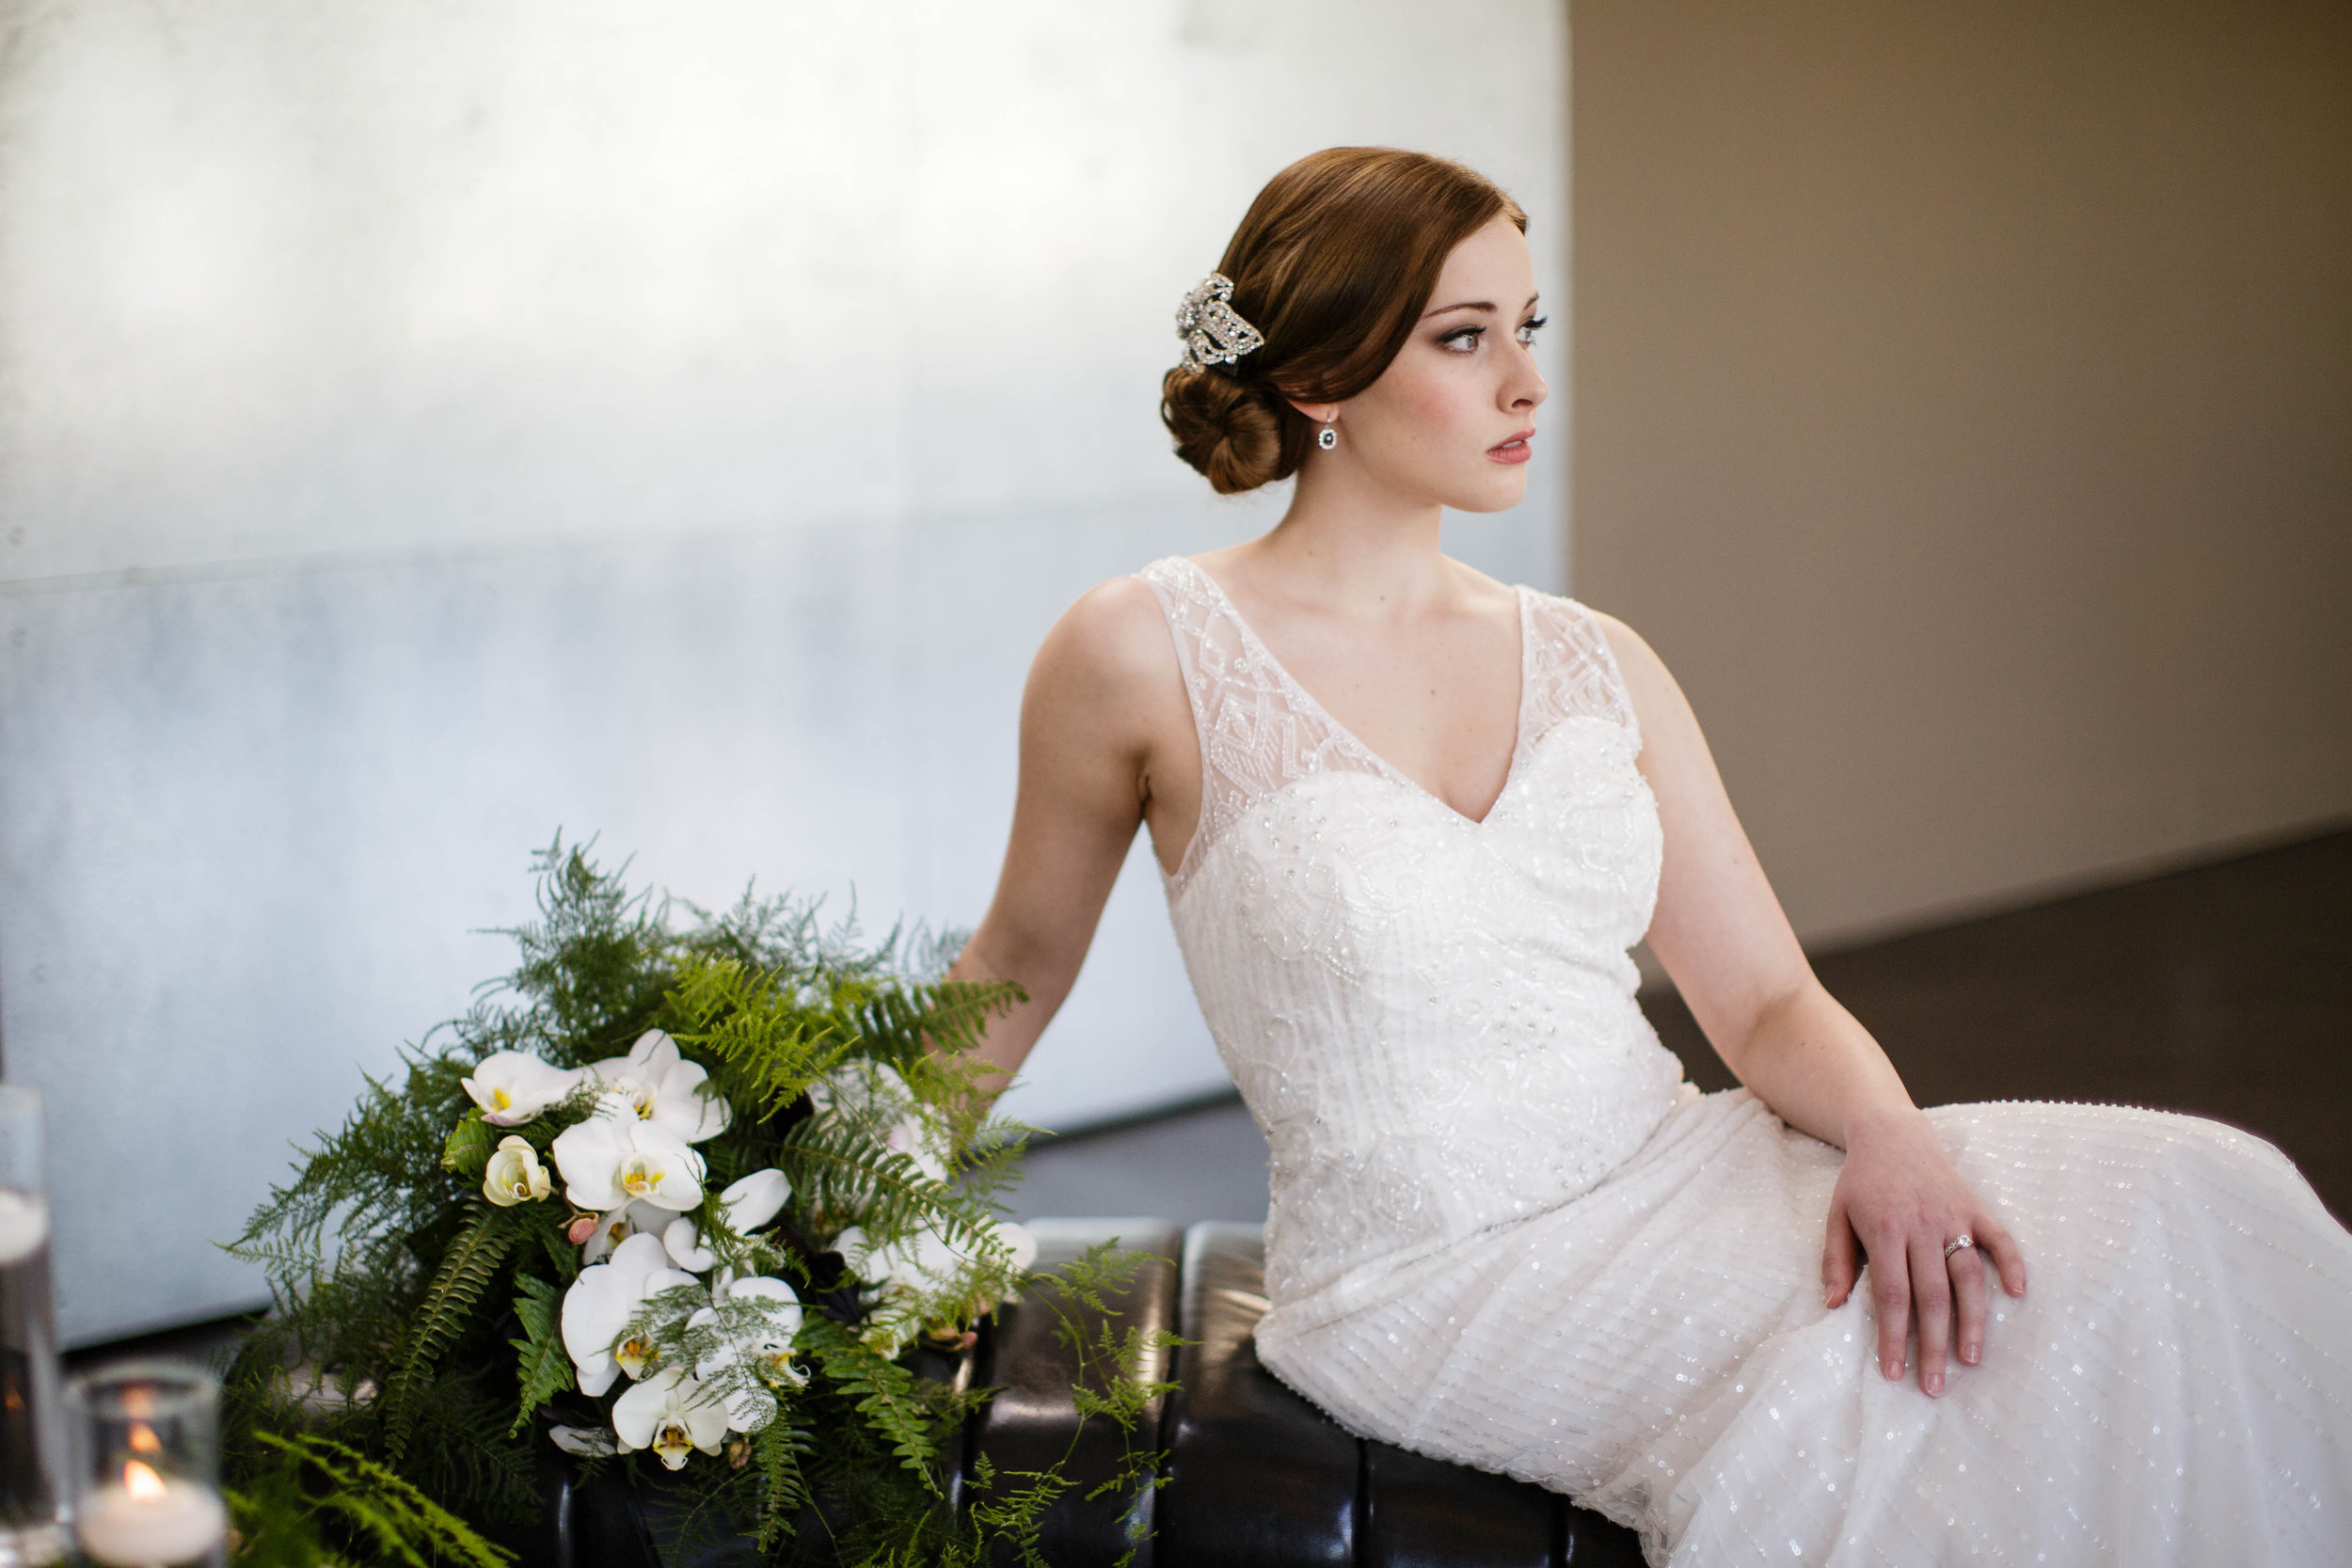 20140125_Styled_Wedding_Shoot_Modern_Elegance_085.jpg